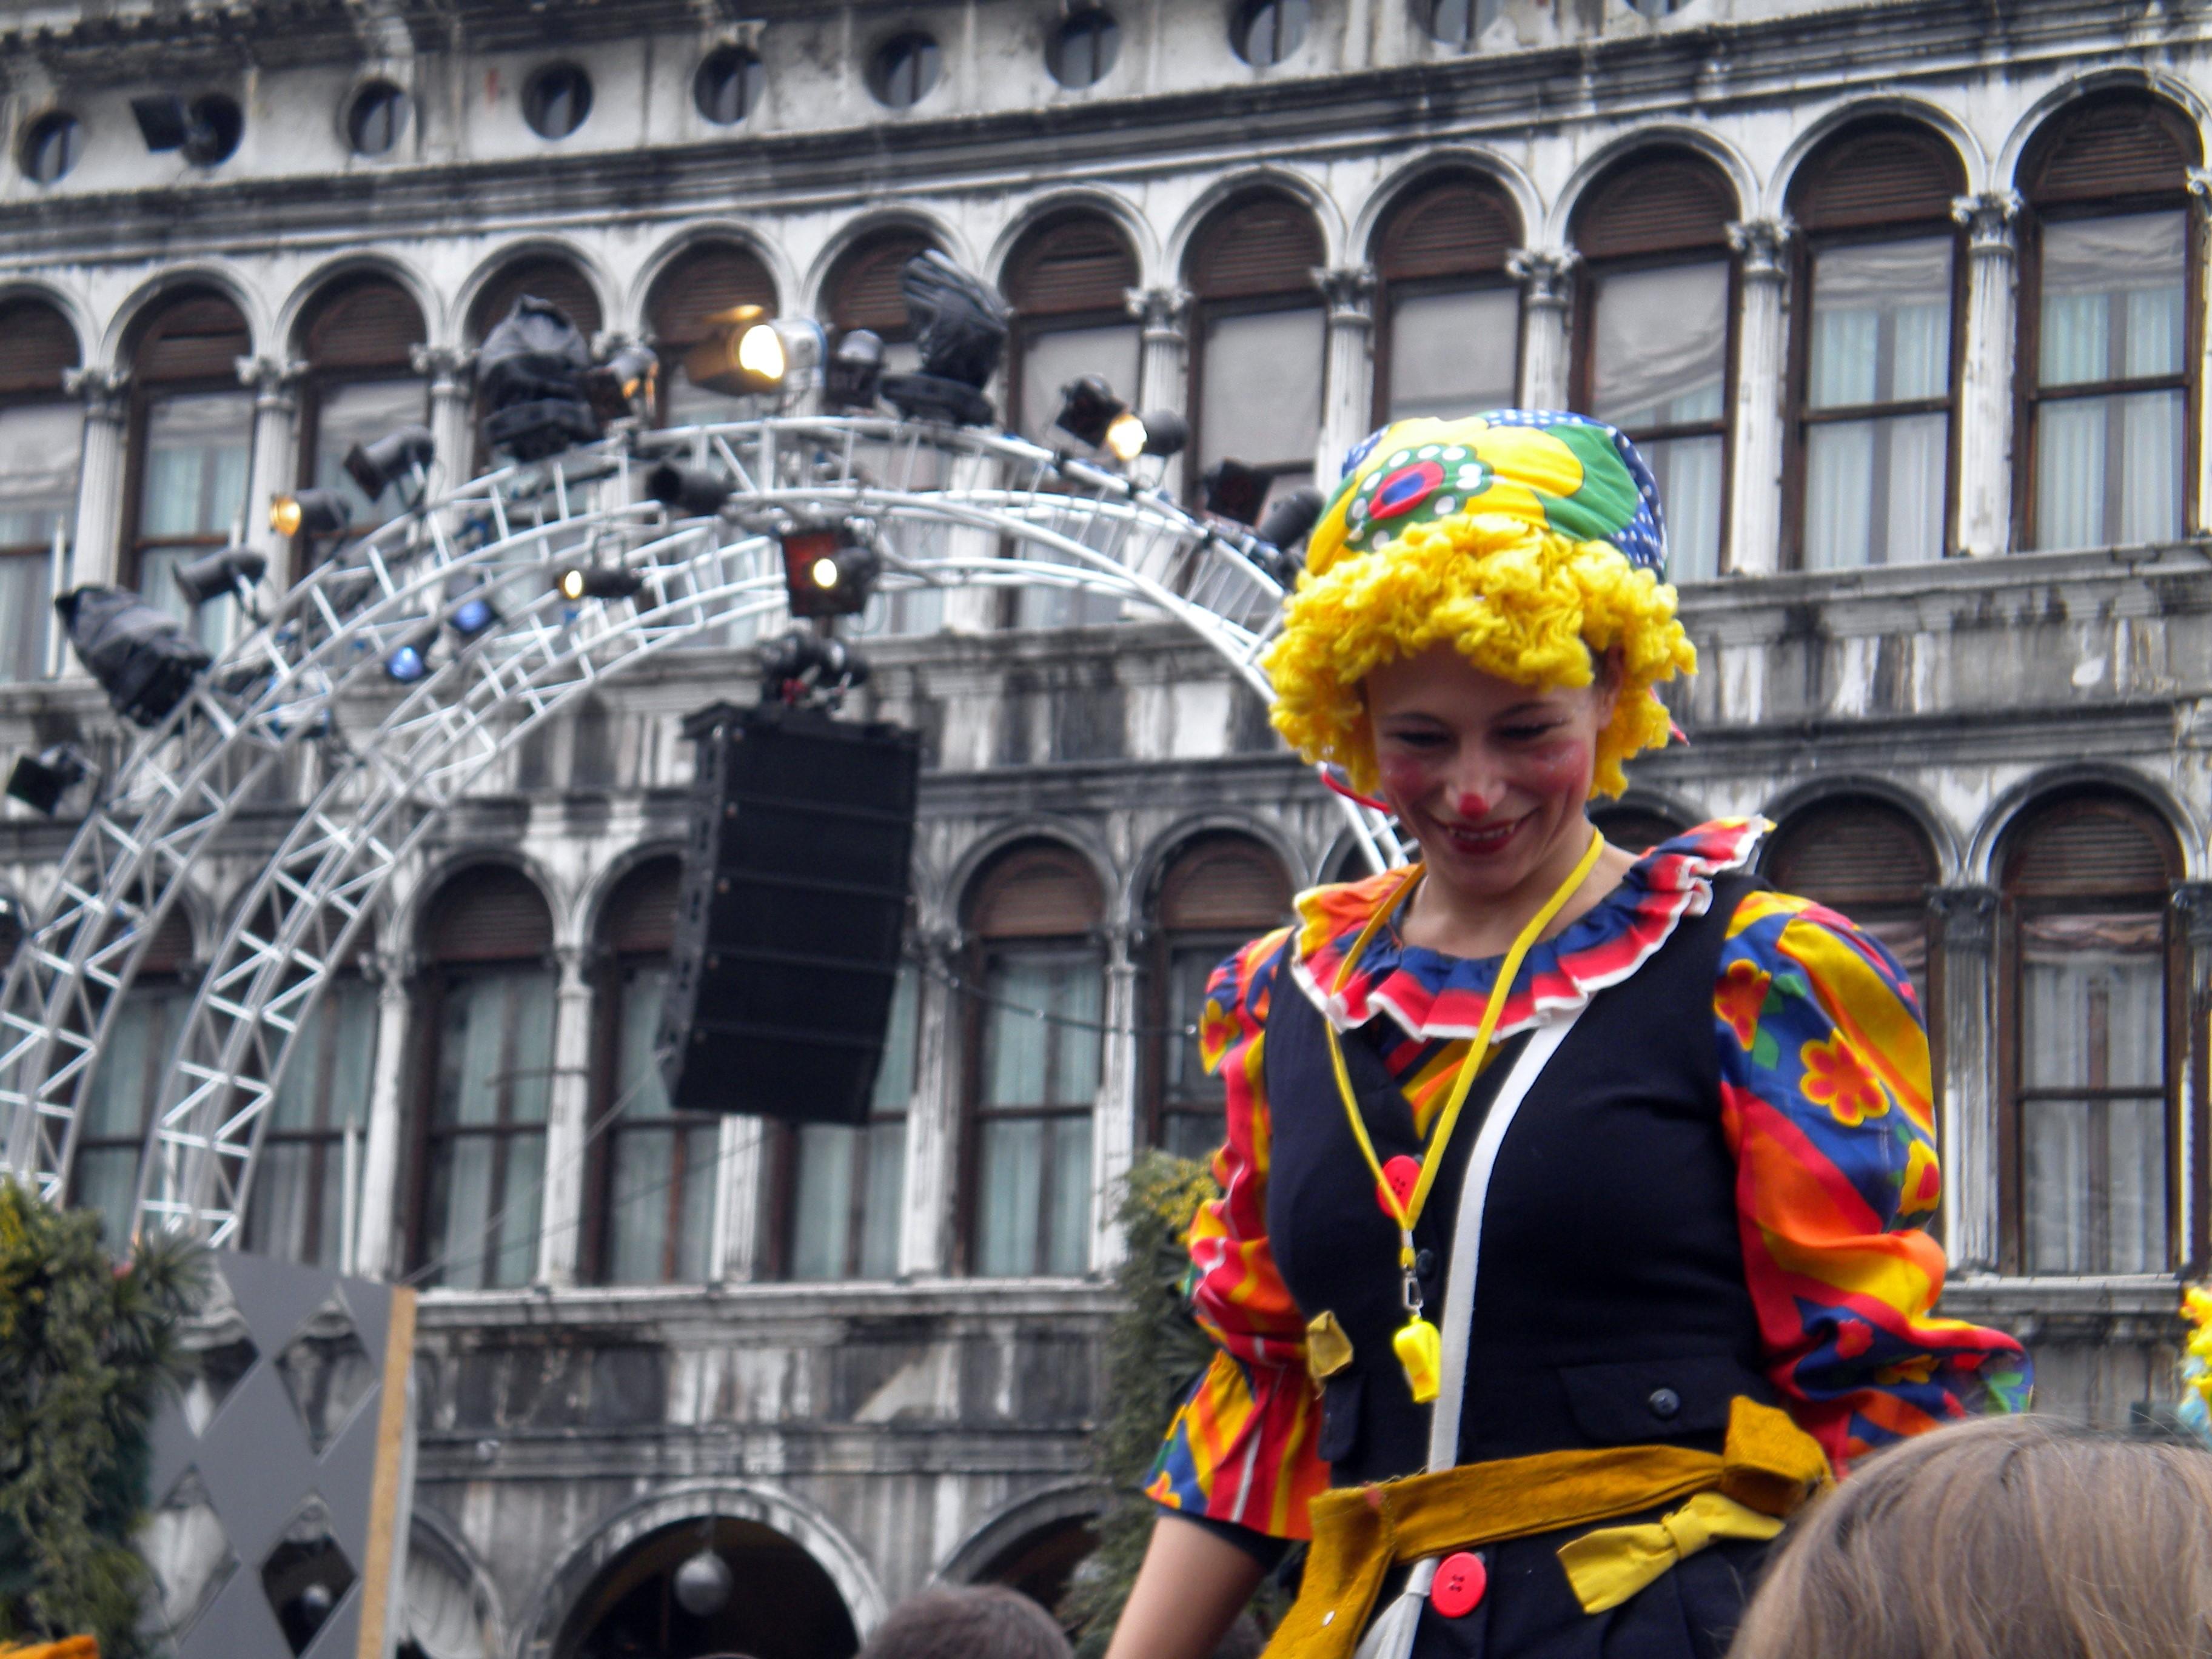 ItalyinPhotos-Carnivale.jpg